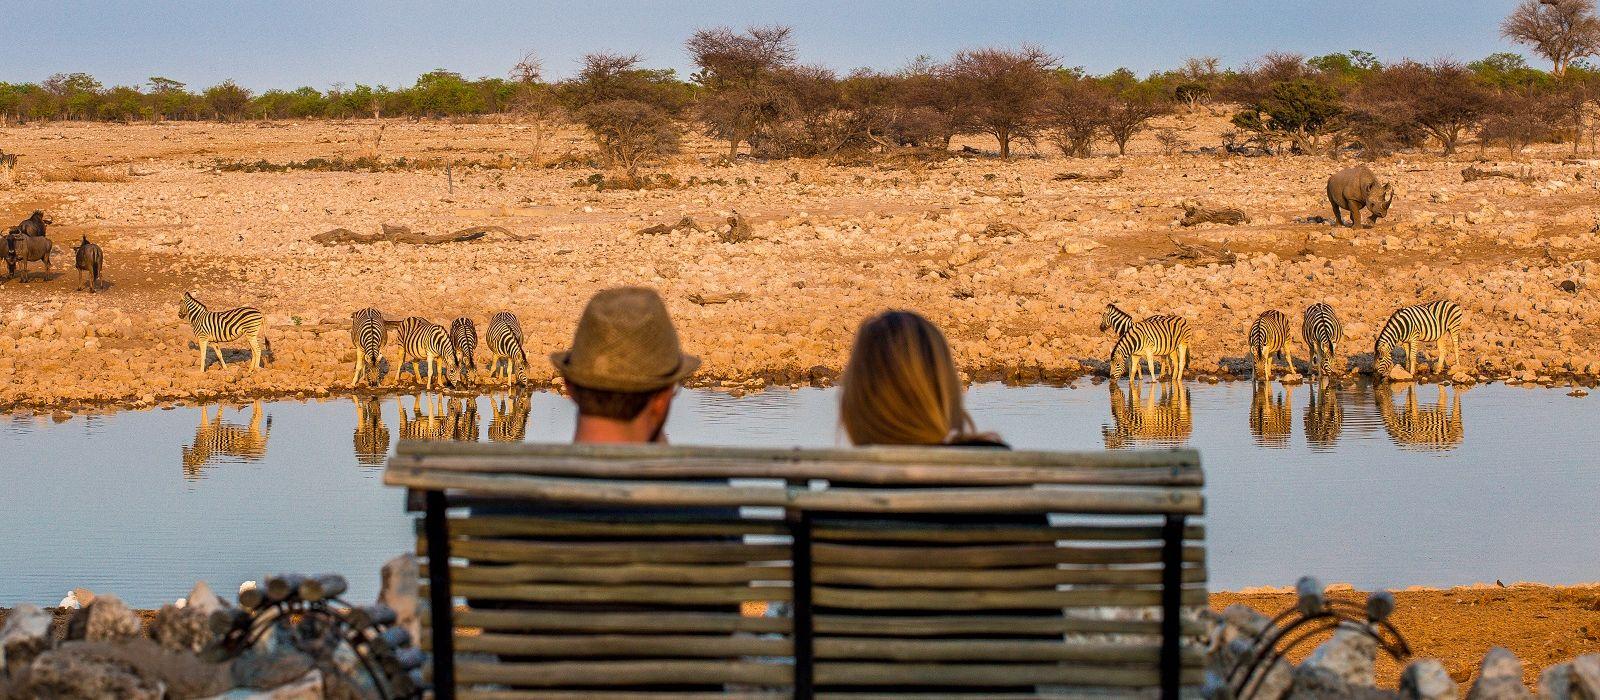 Selbstfahrer-Reise nach Südafrika, Namibia & Simbabwe: Nord Kap via Caprivi und Viktoriafälle Urlaub 8